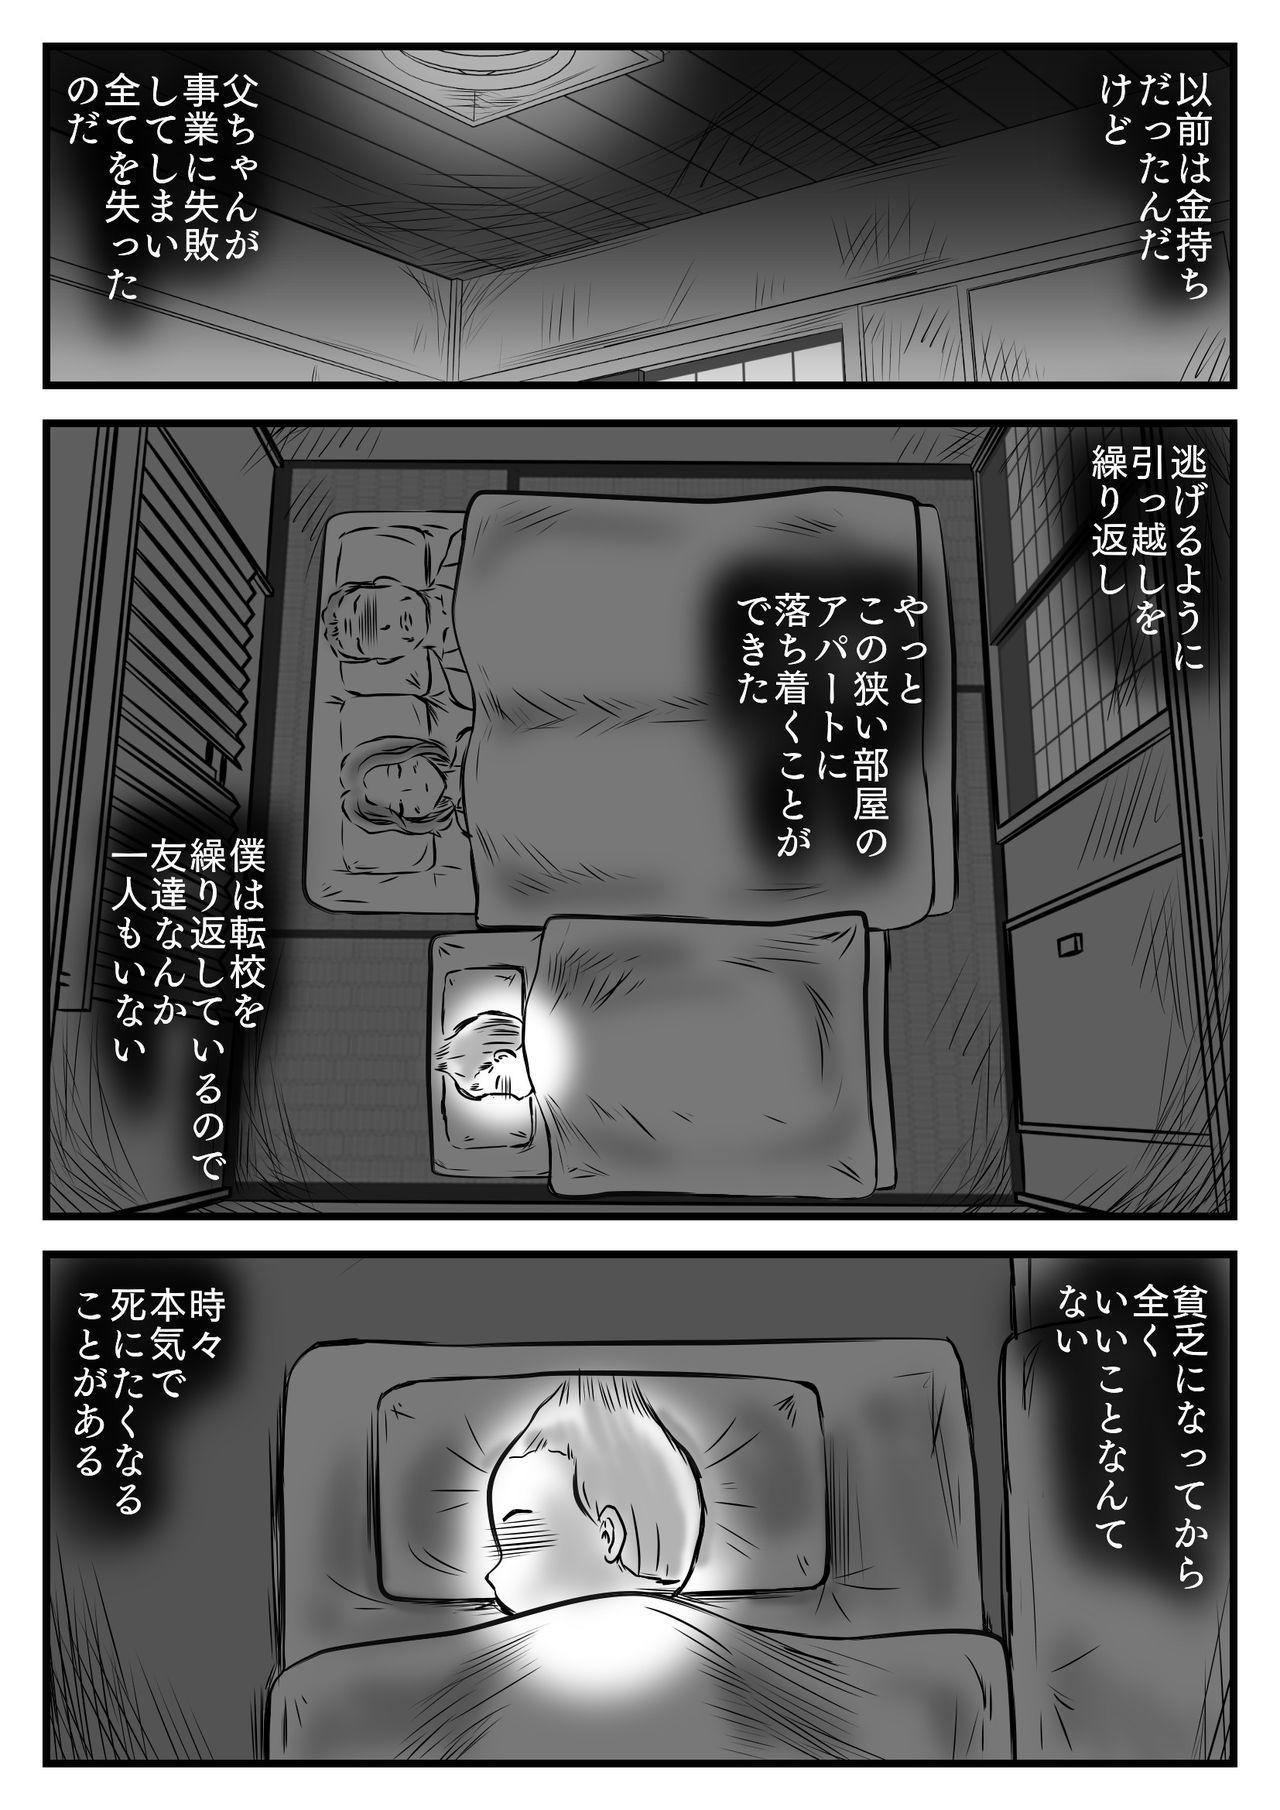 Owabi to Iccha Nanda ga Kaa-chan Daku? 2